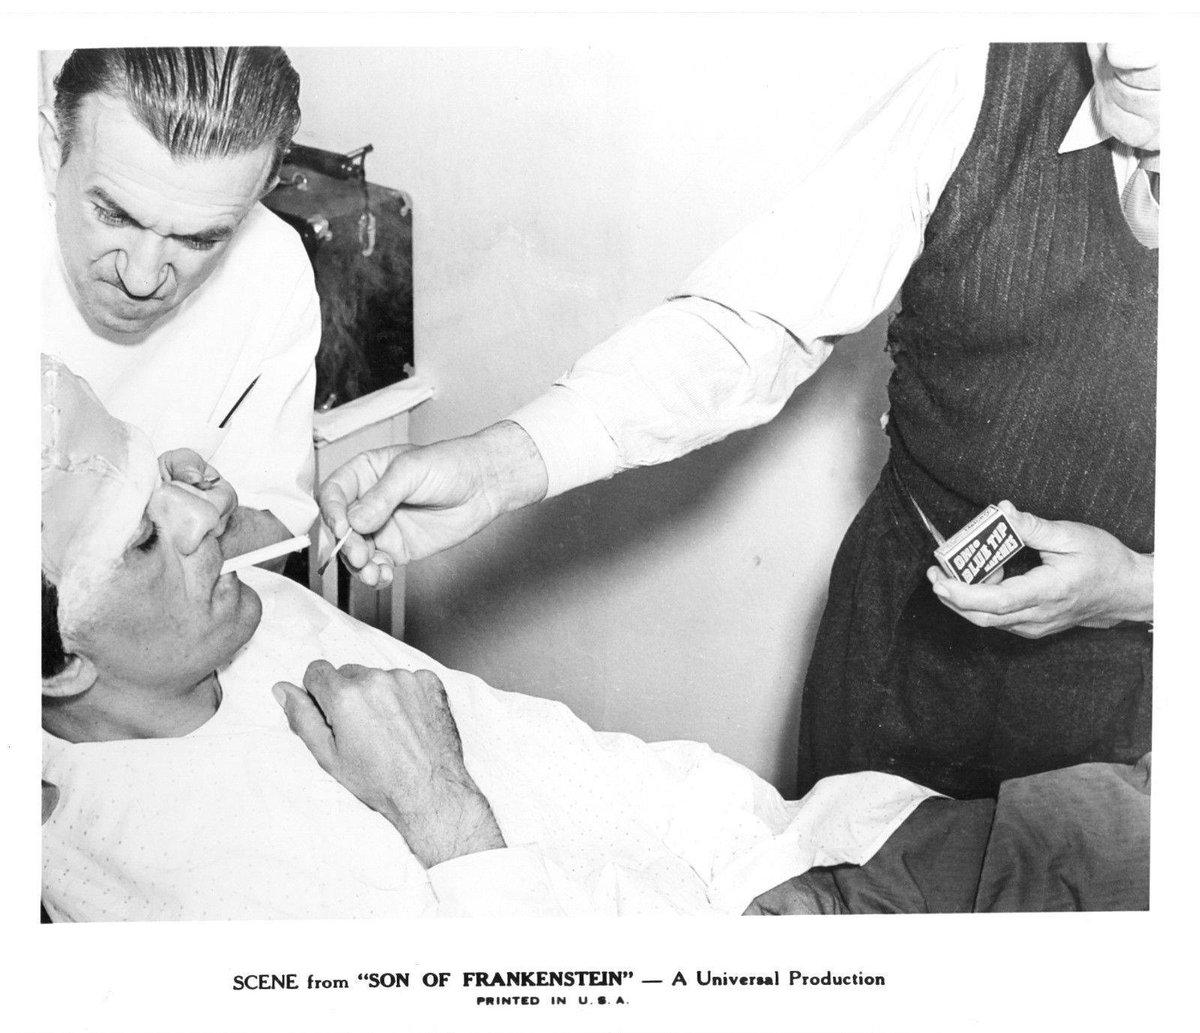 Master #Make-up #JackPierce works on #BorisKarloff for #Son of #Frankenstein<br>http://pic.twitter.com/Sr8v07Uzmi